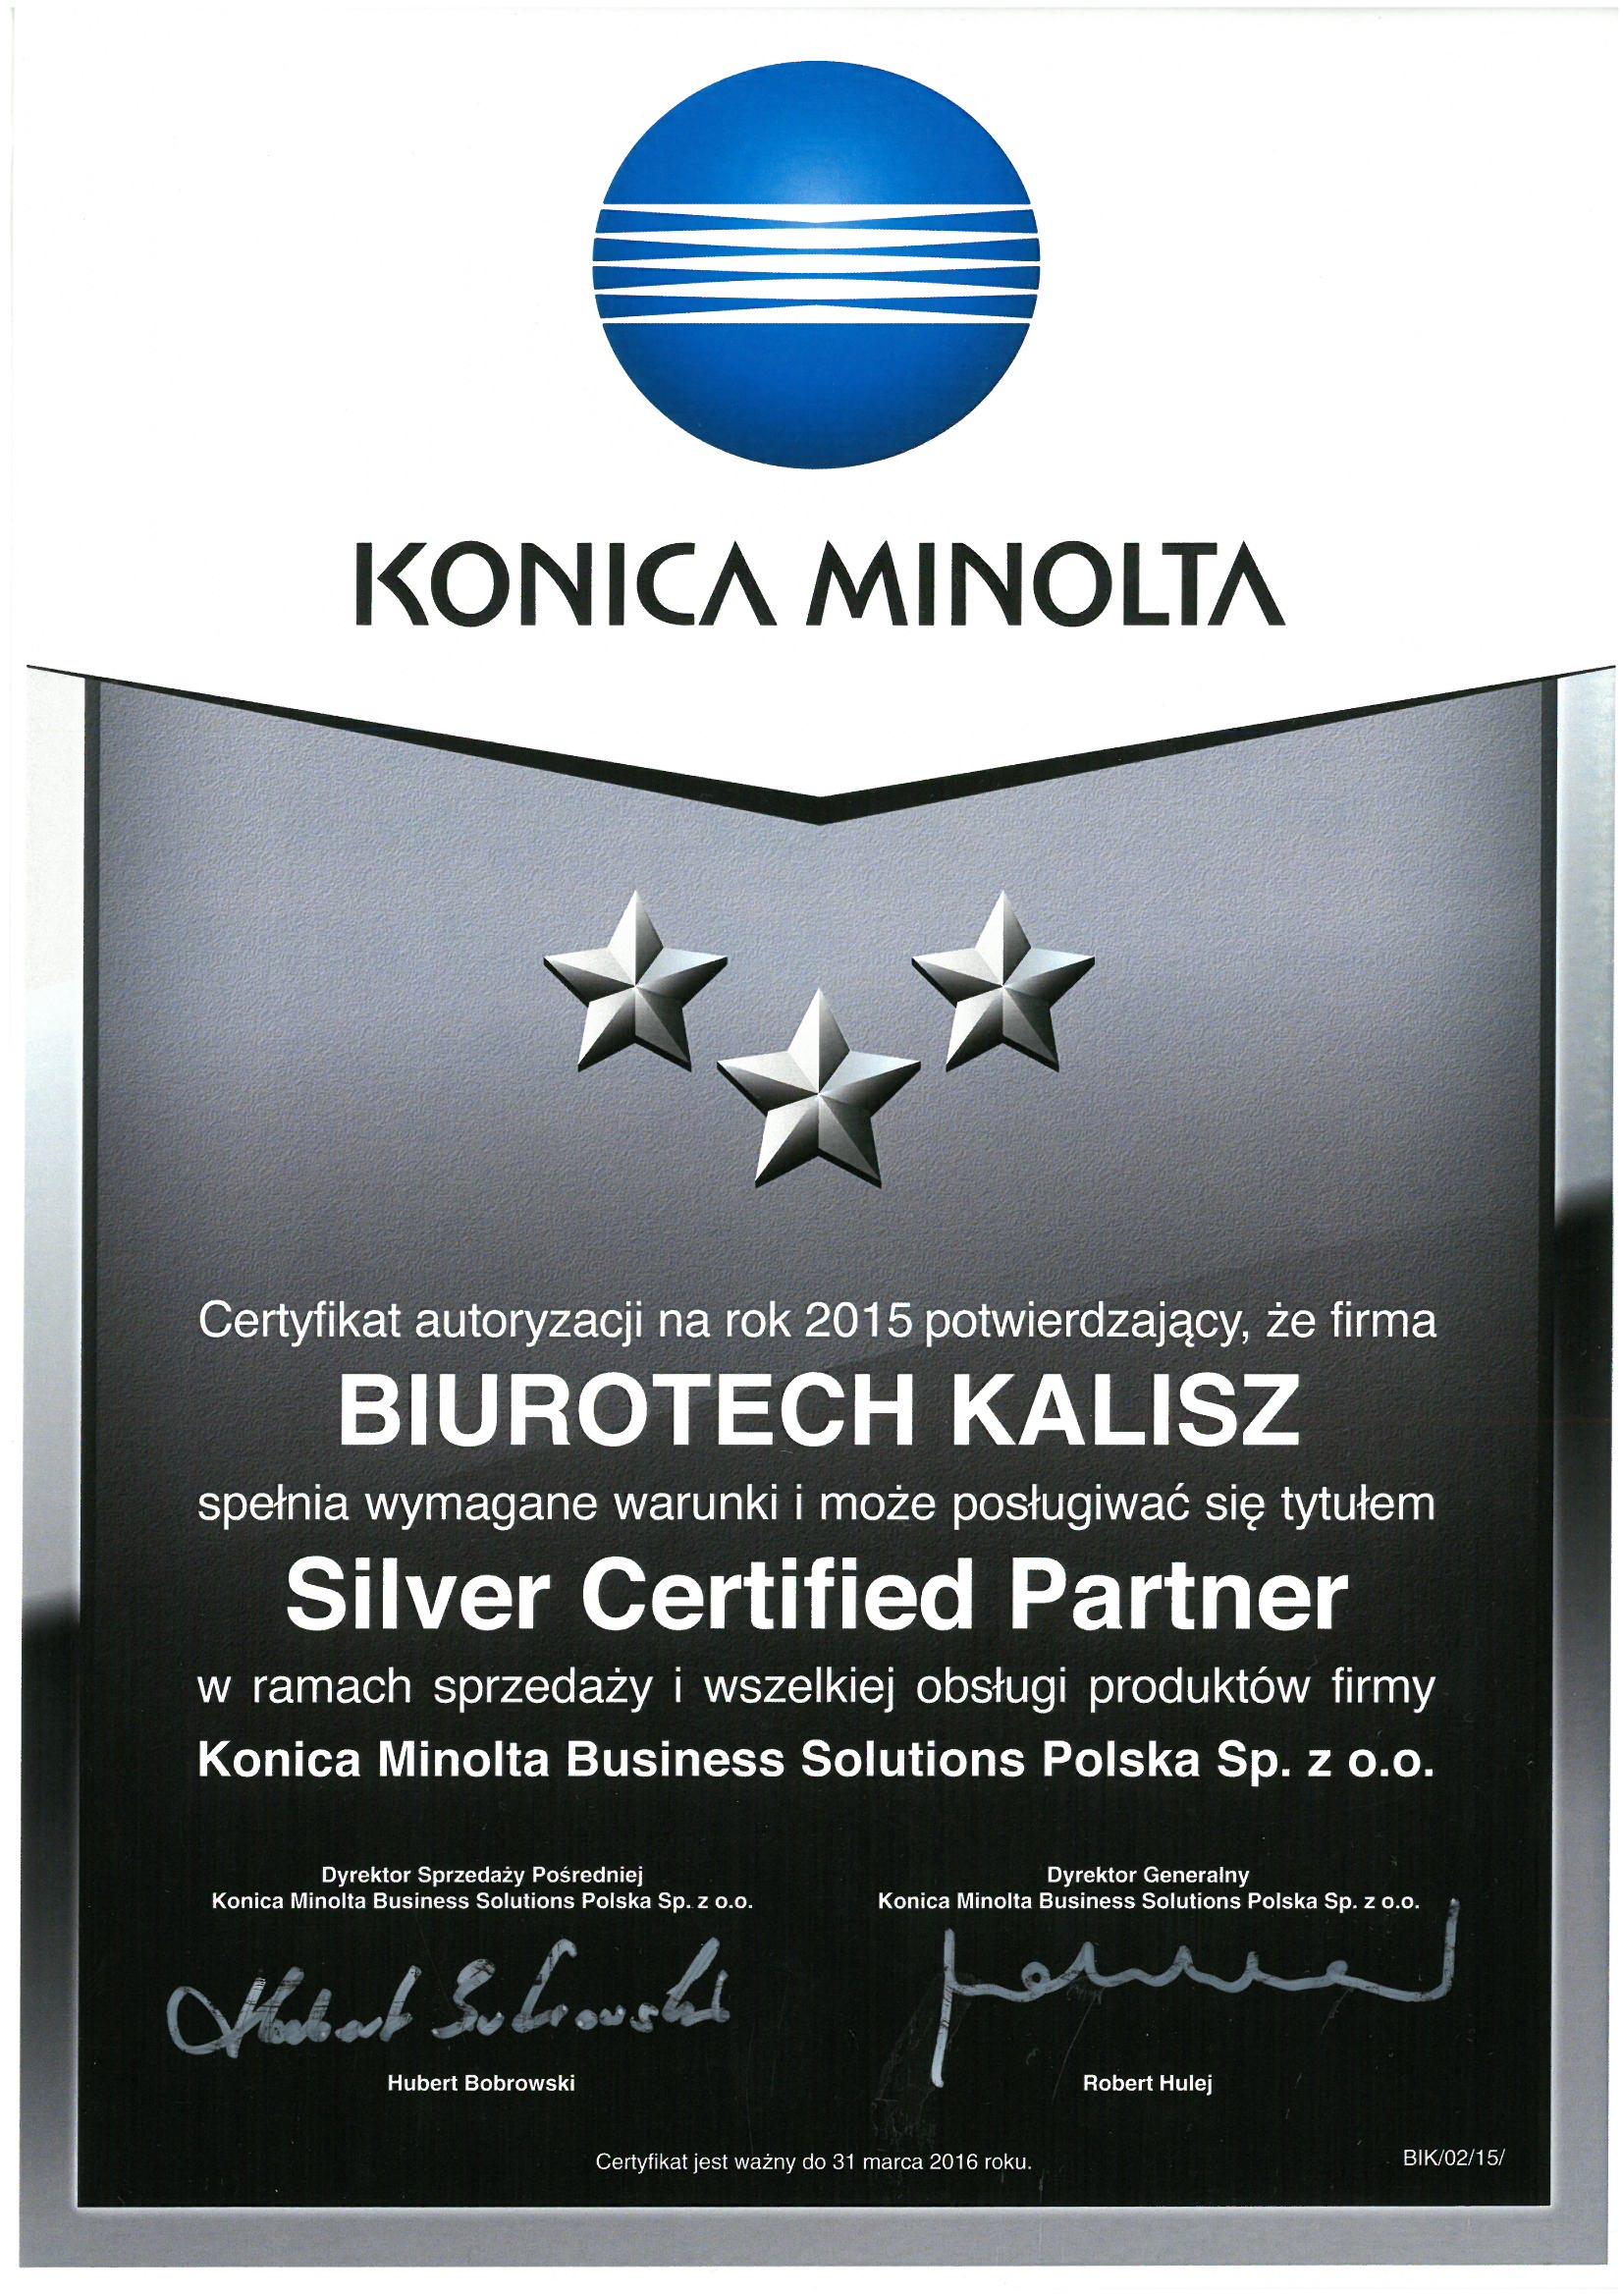 Biurotech - autoryzowany partner Konica Minolta 2015